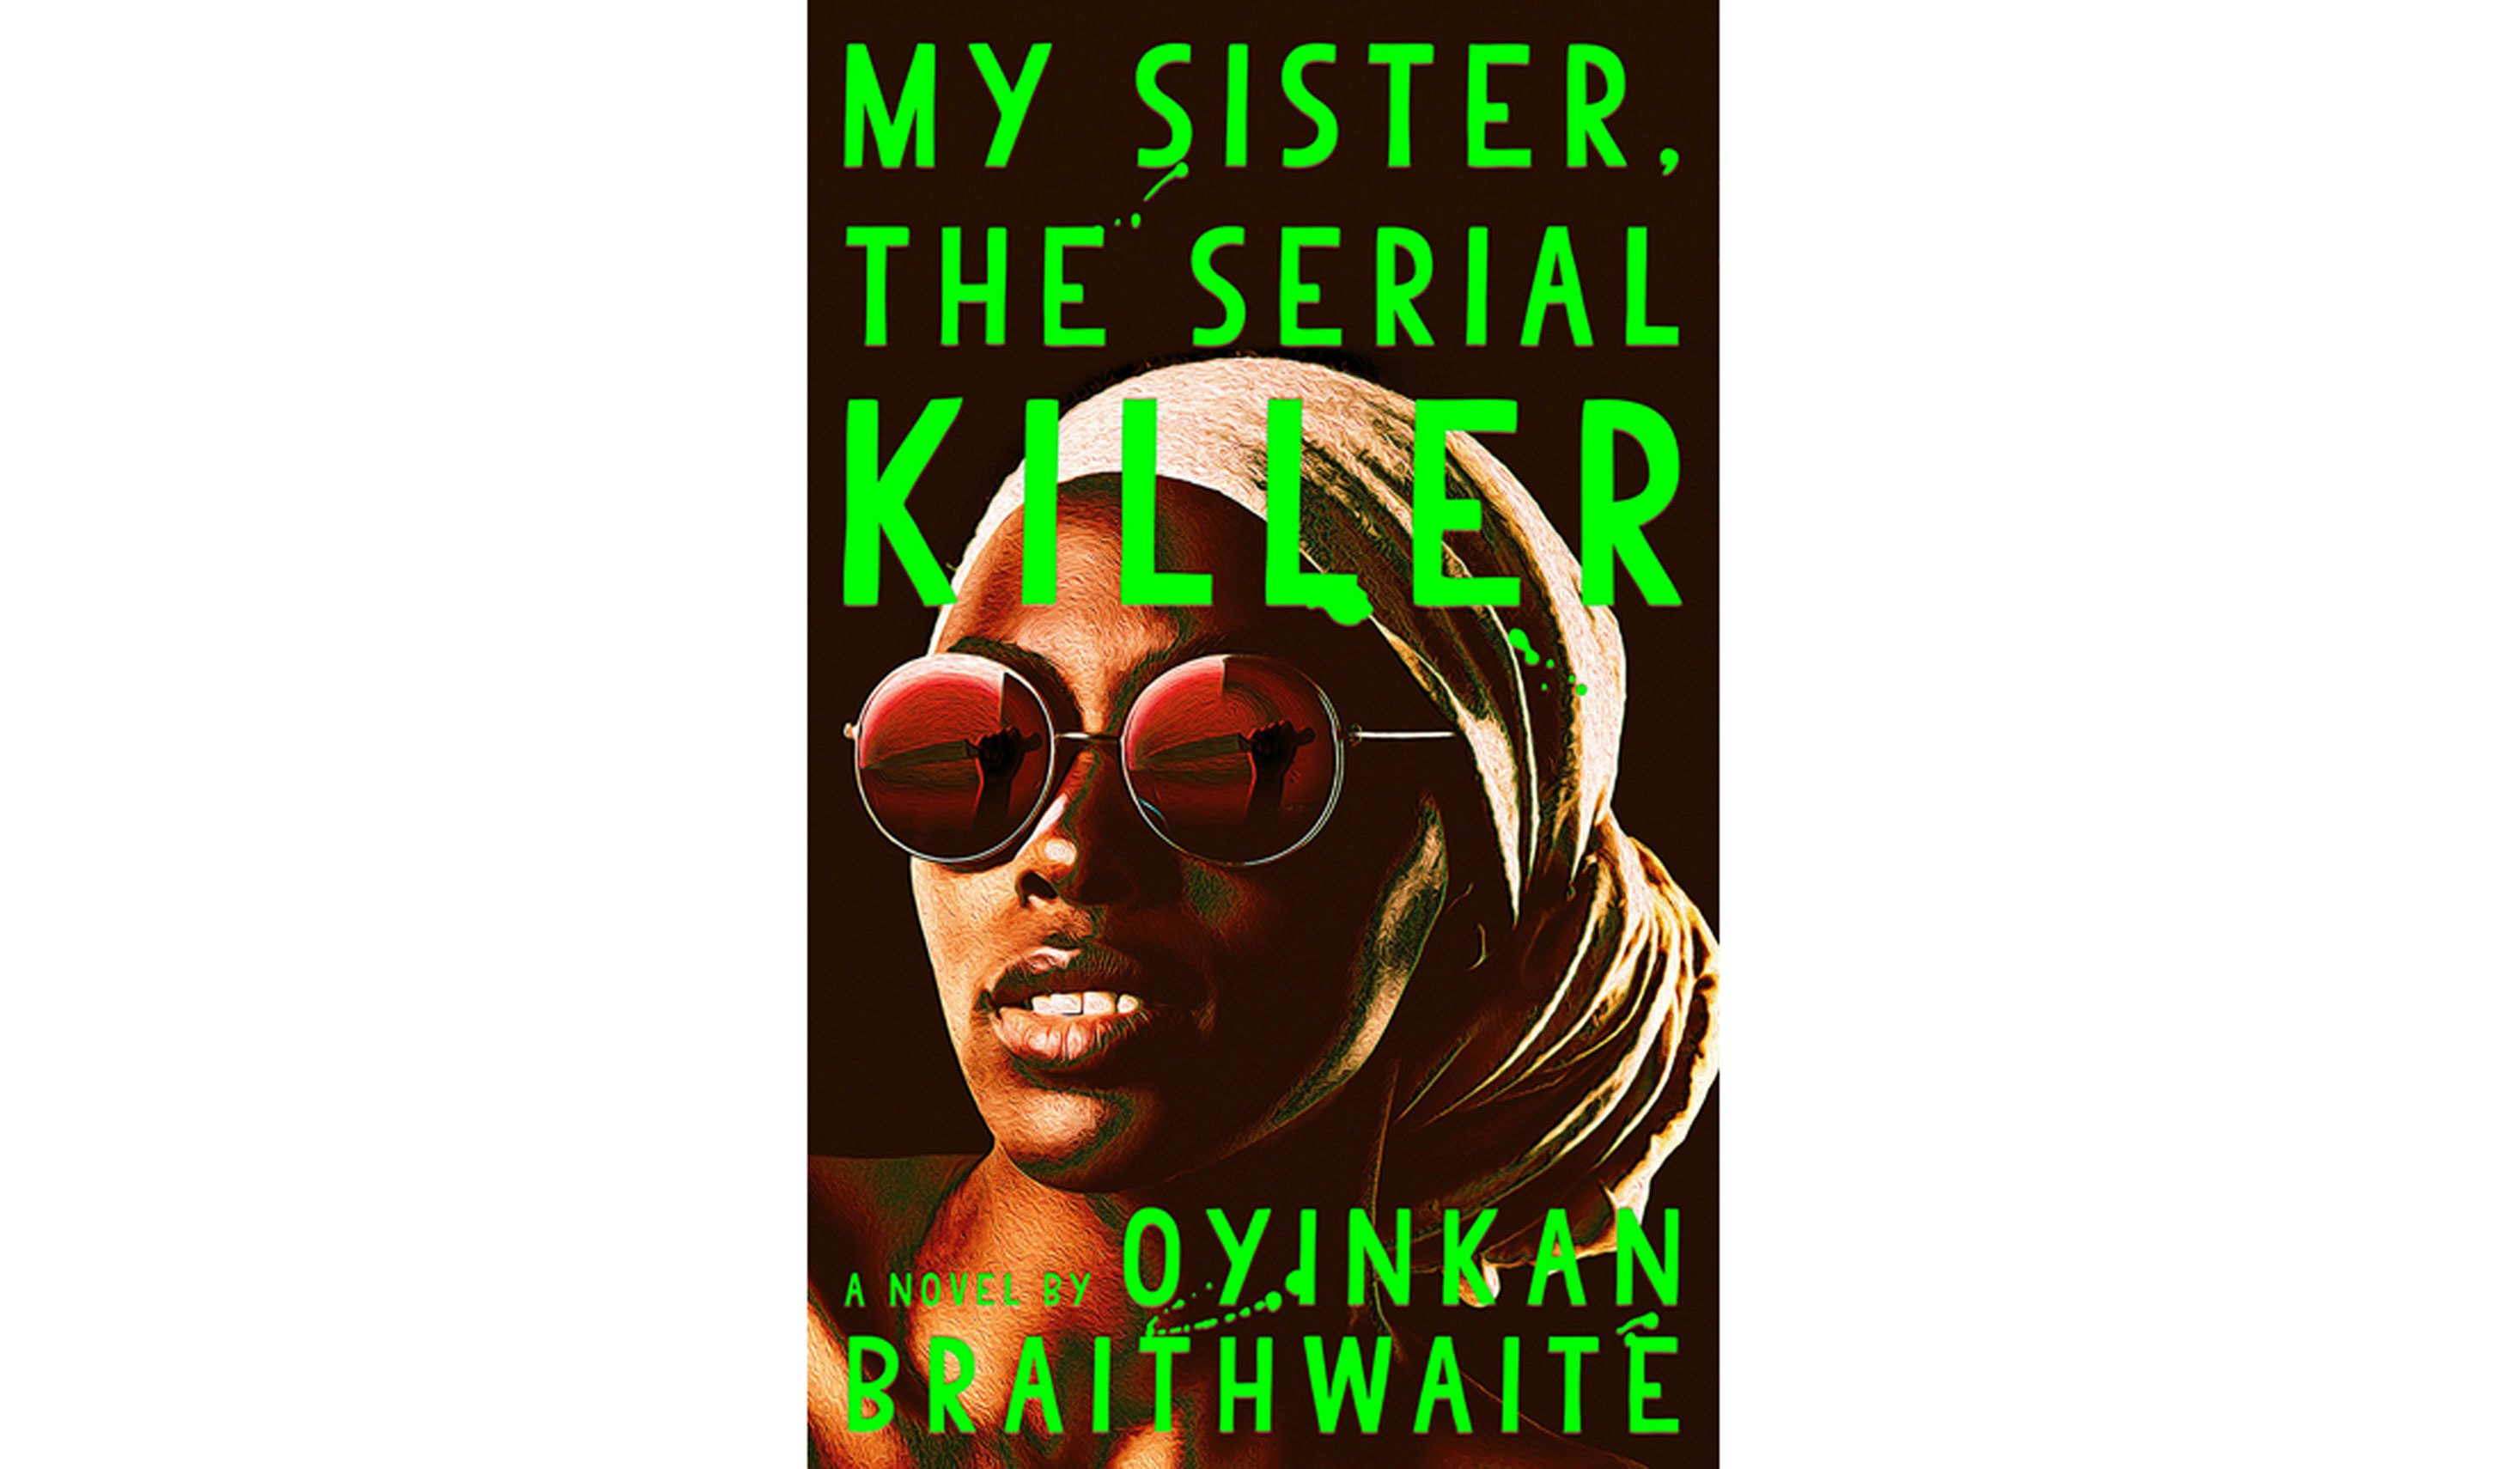 BOOK REVIEW: 'My Sister the Serial Killer' by Oyinkan Braithwaite